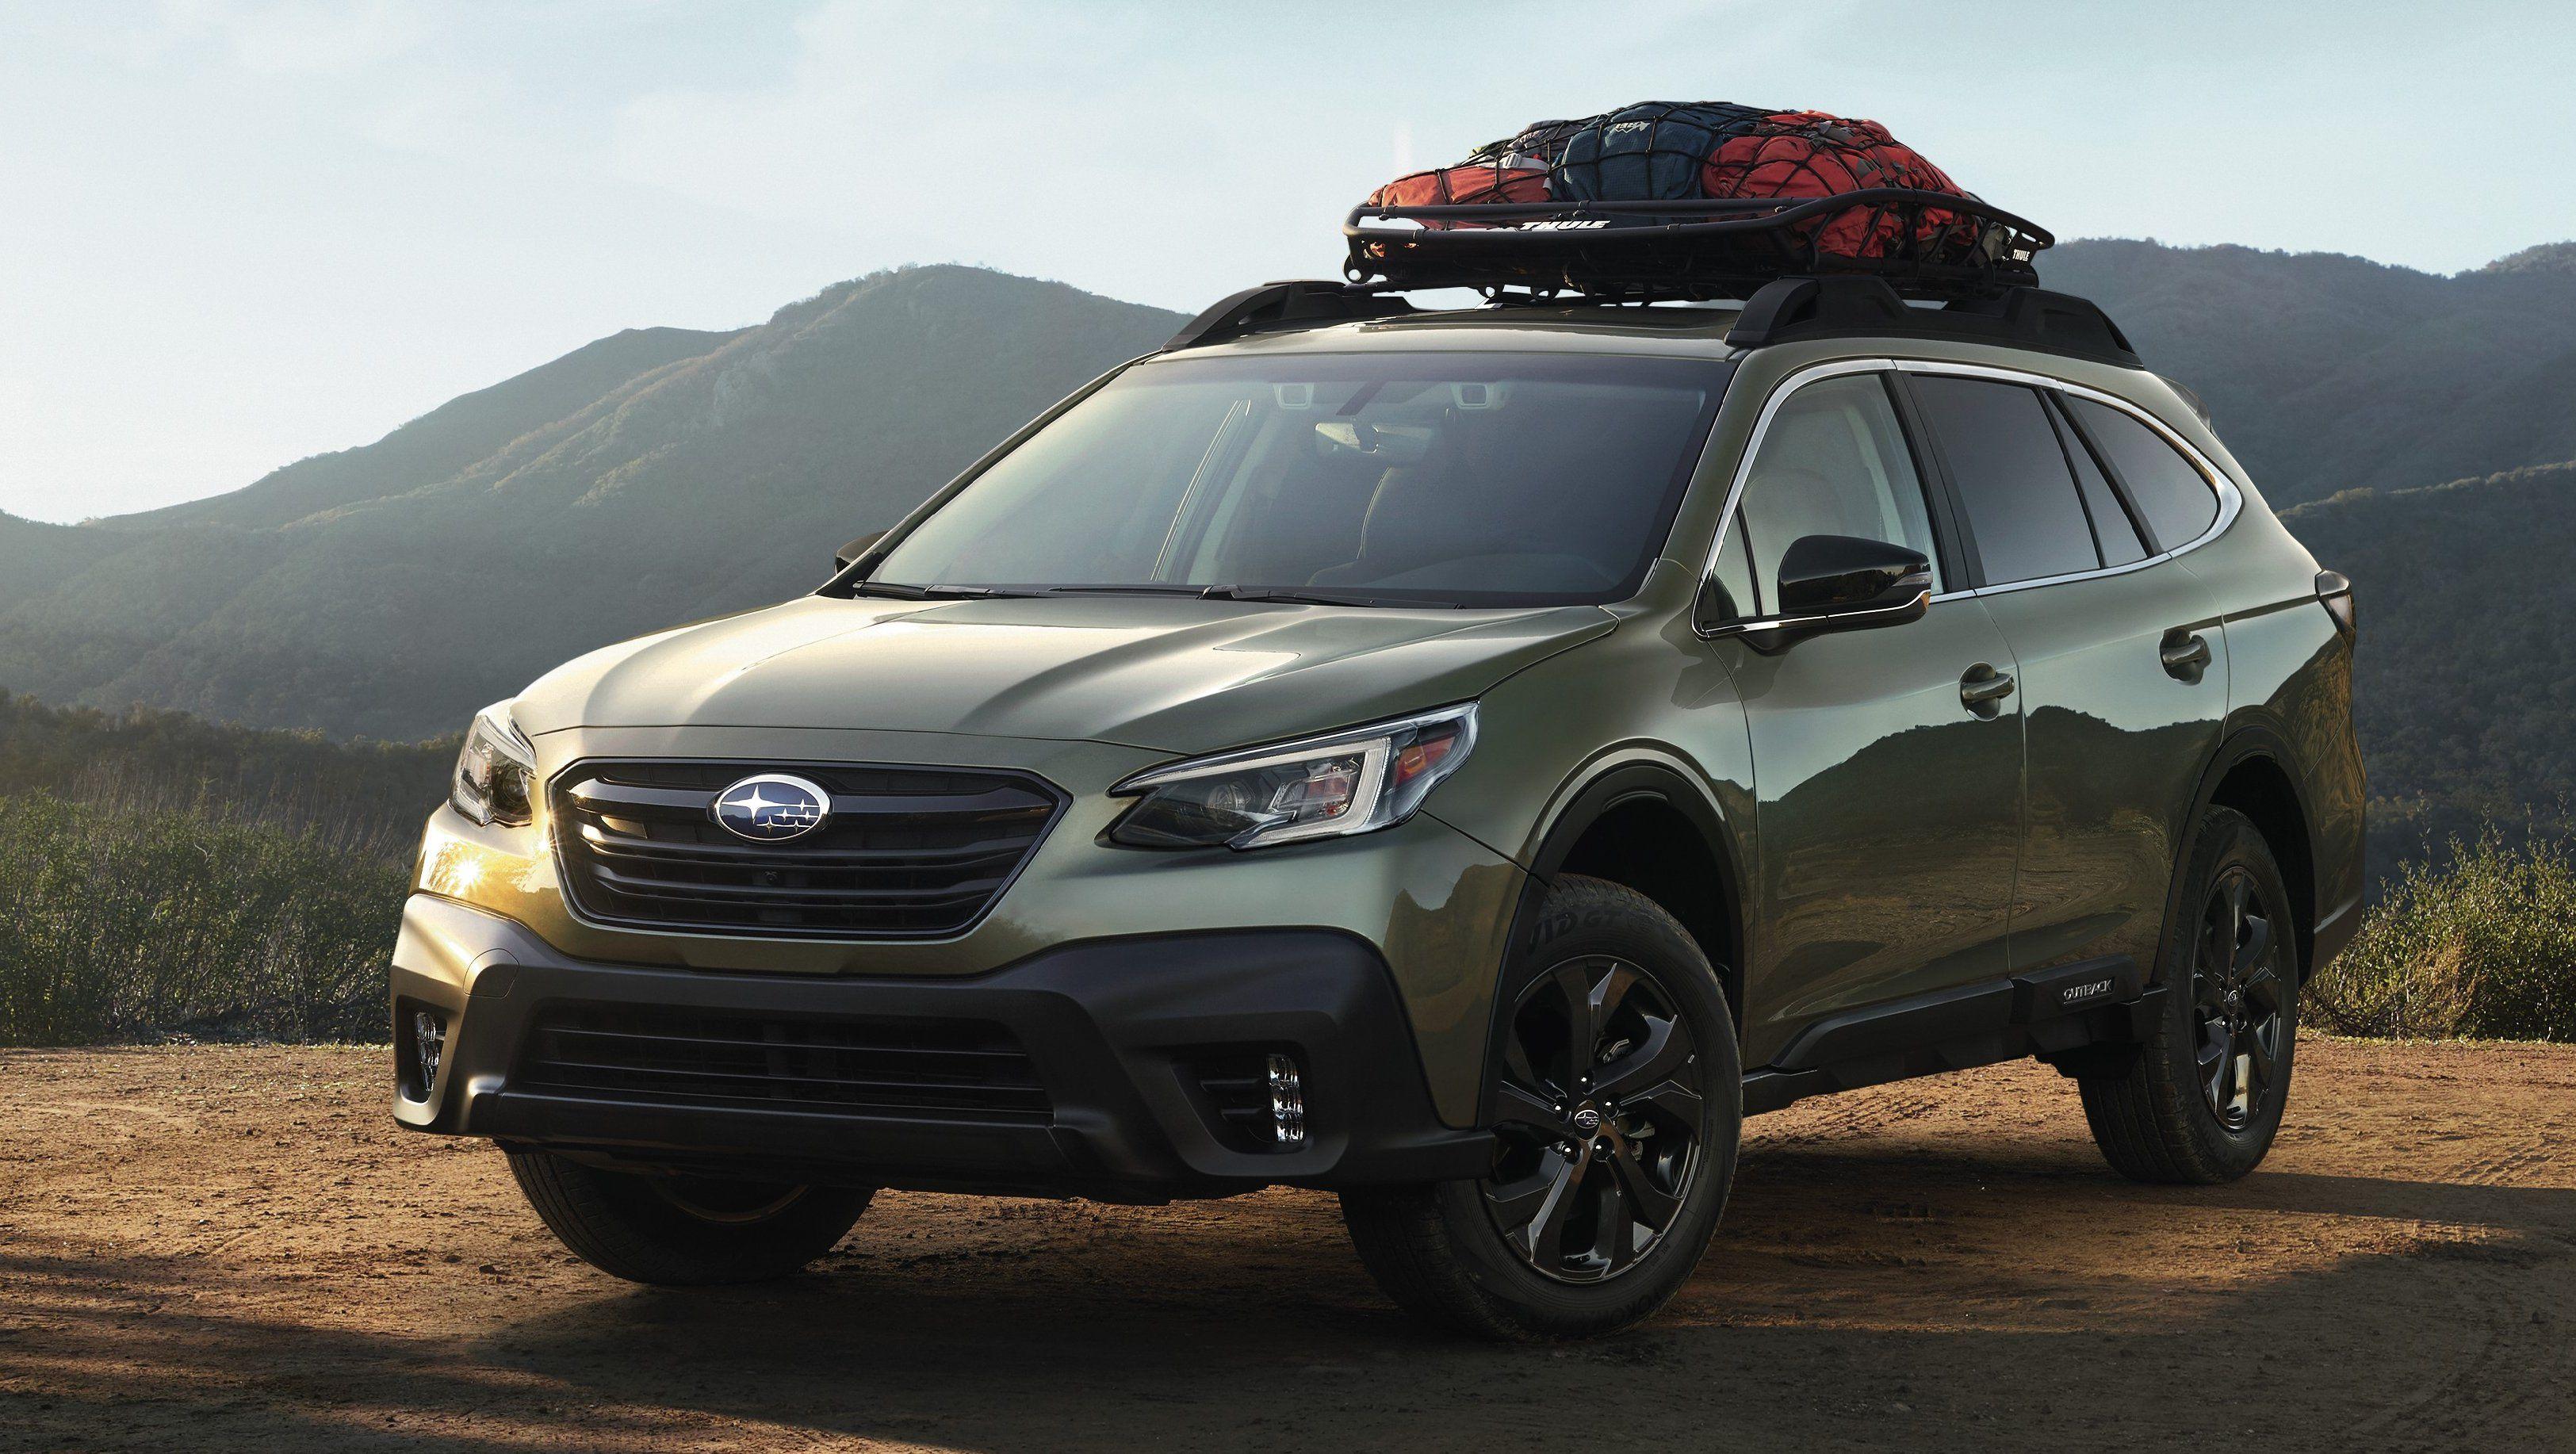 2020 Subaru Outback Turbo Hybrid (With images) Subaru